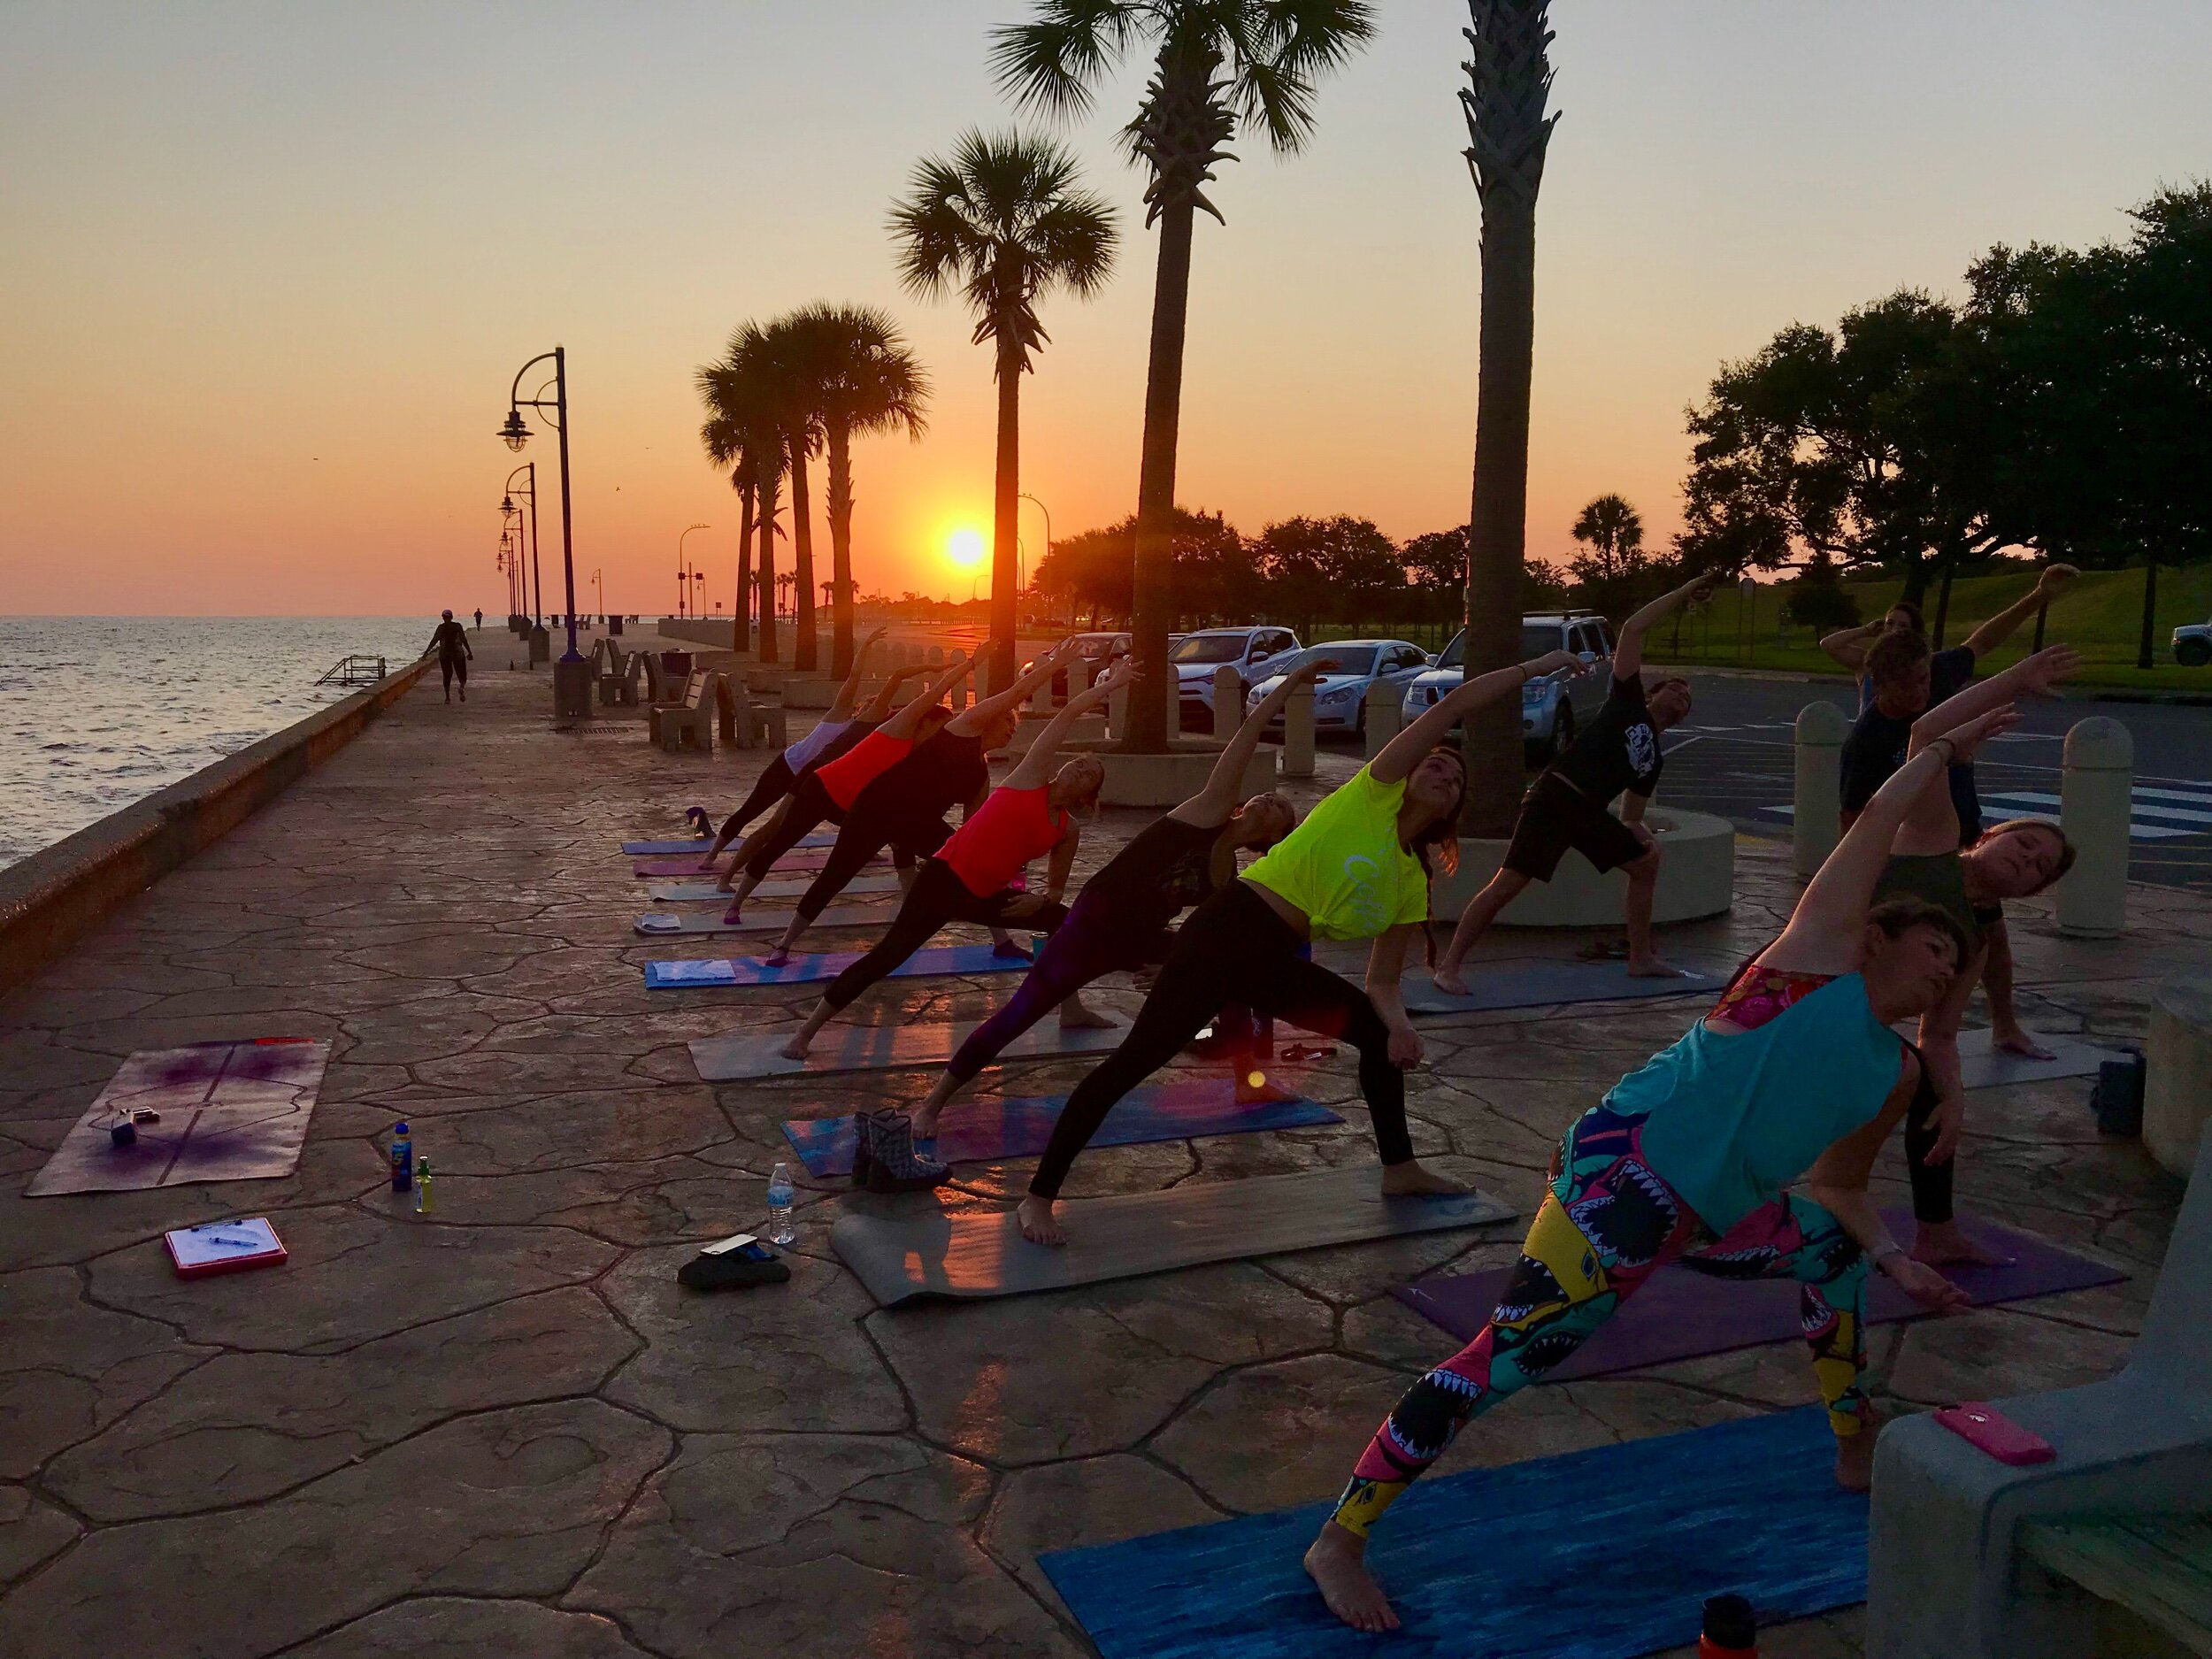 NOLA Tribe Yoga Retreat: Lakefront Yoga